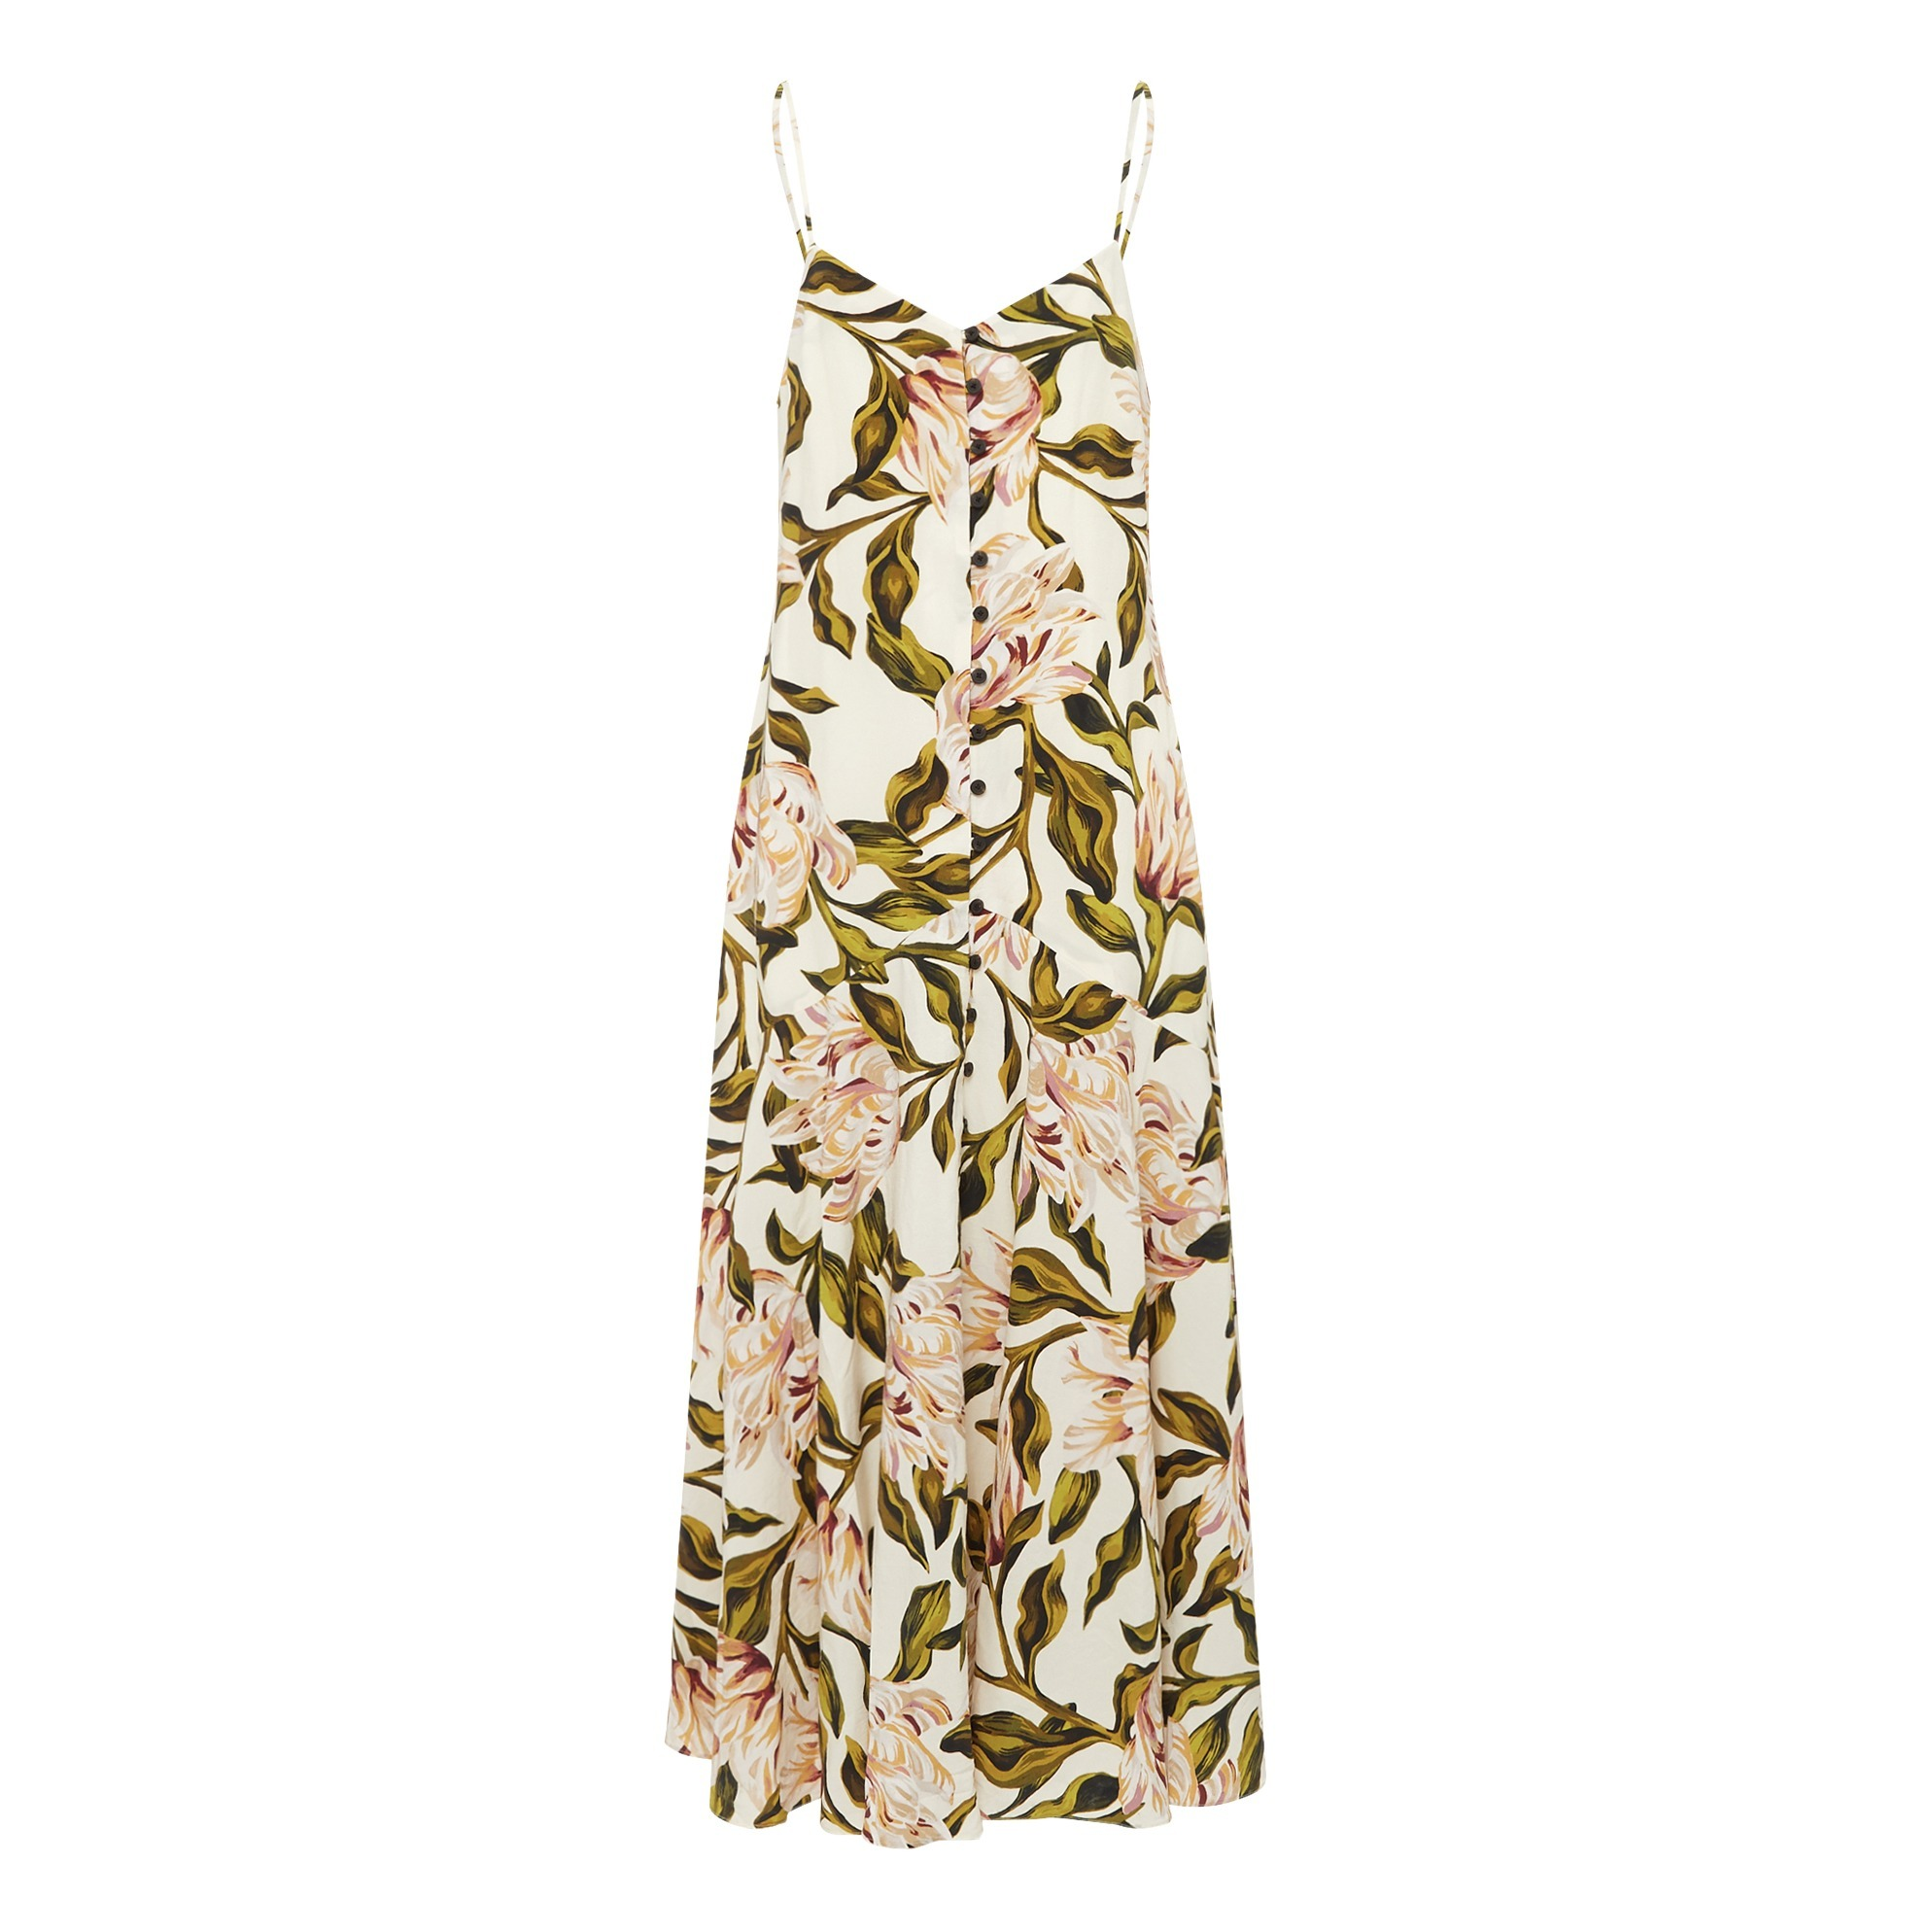 Kleid Diana Tophit Offer 2890